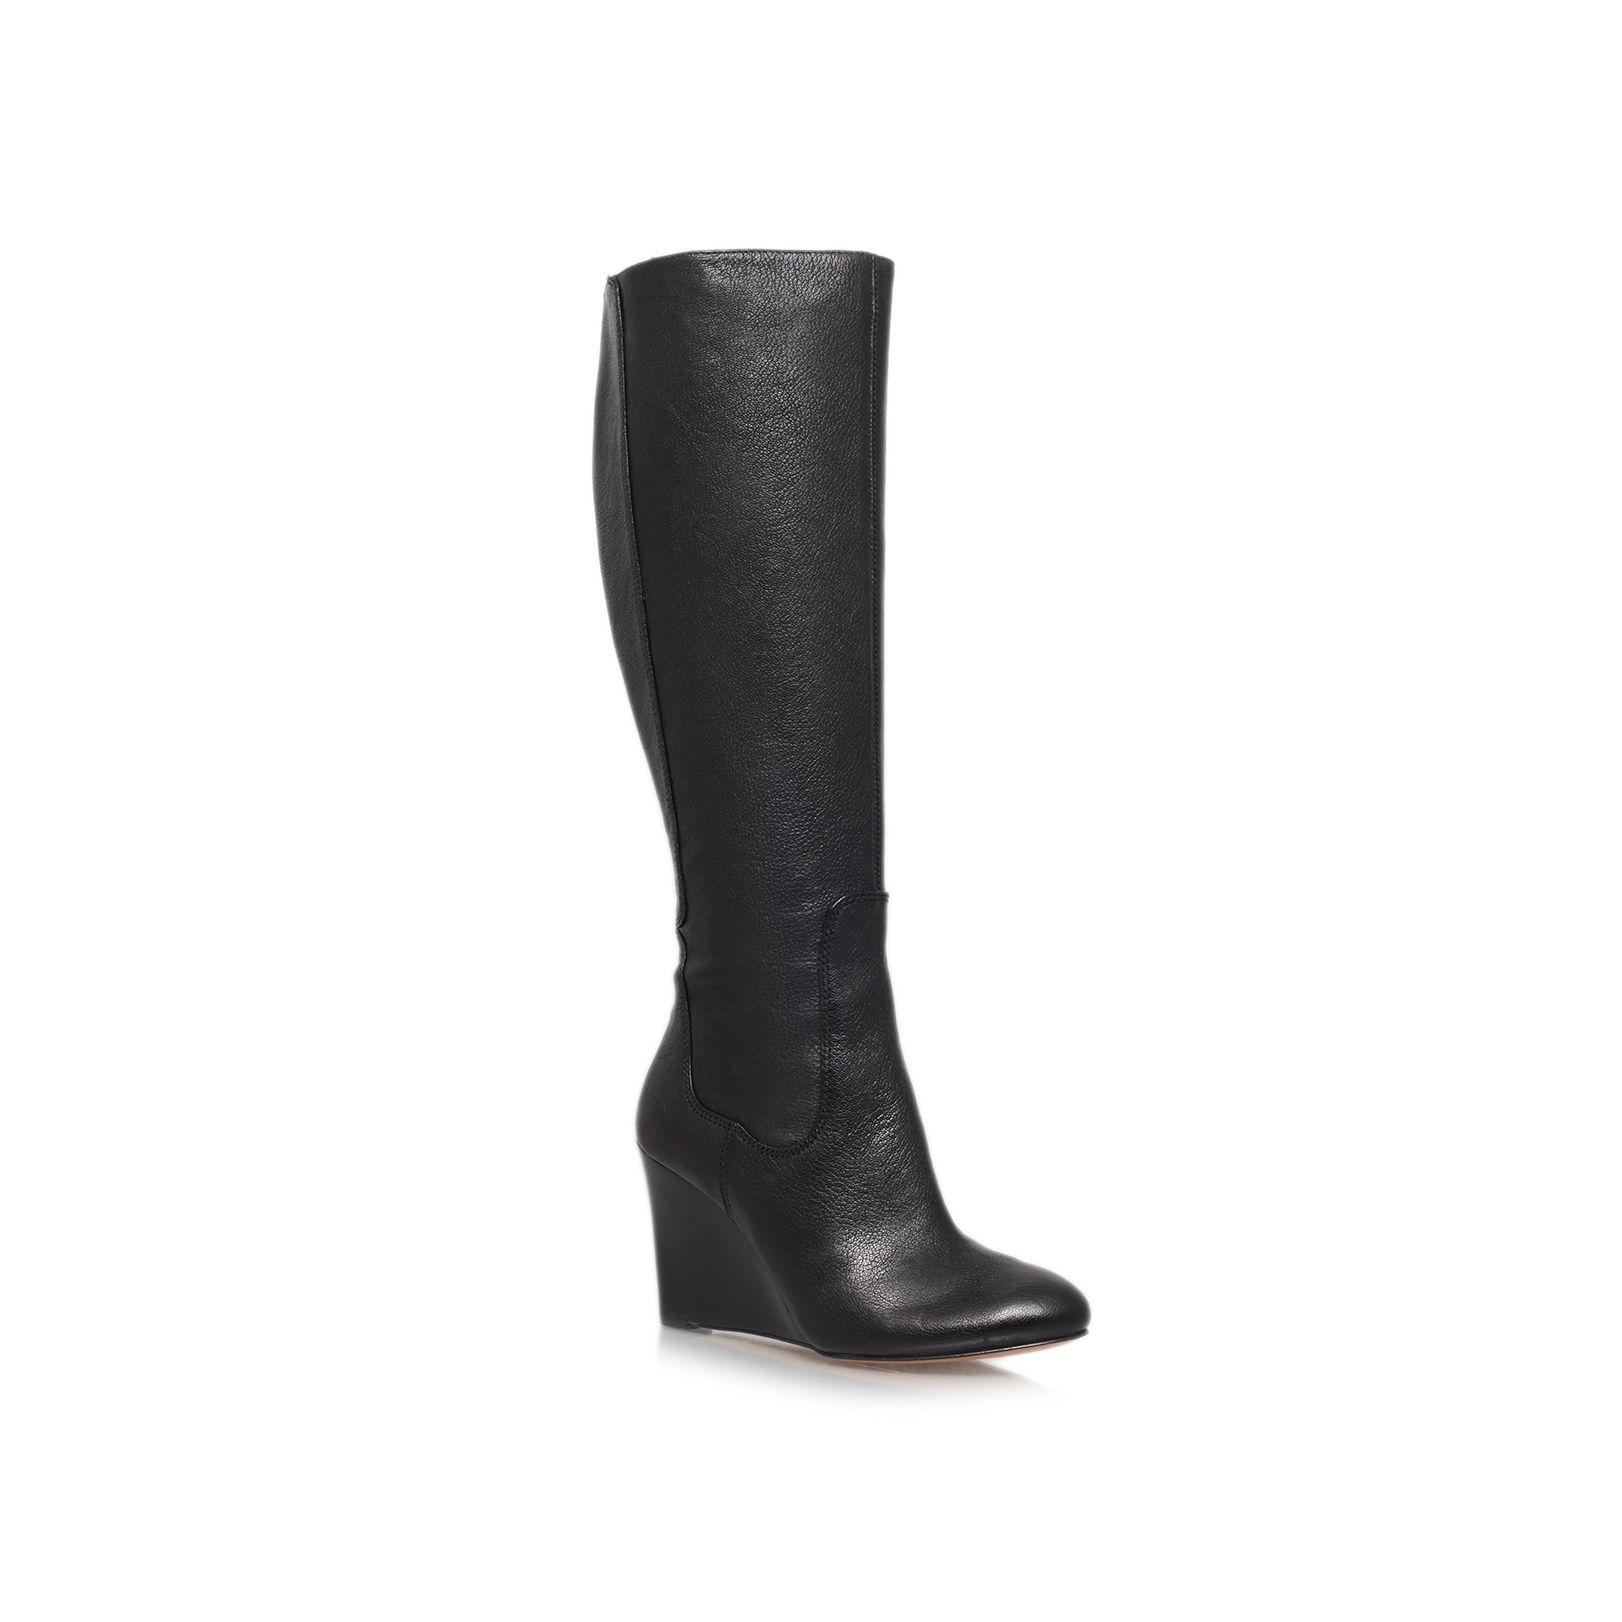 nine west heartset high wedge heeled knee high boot in